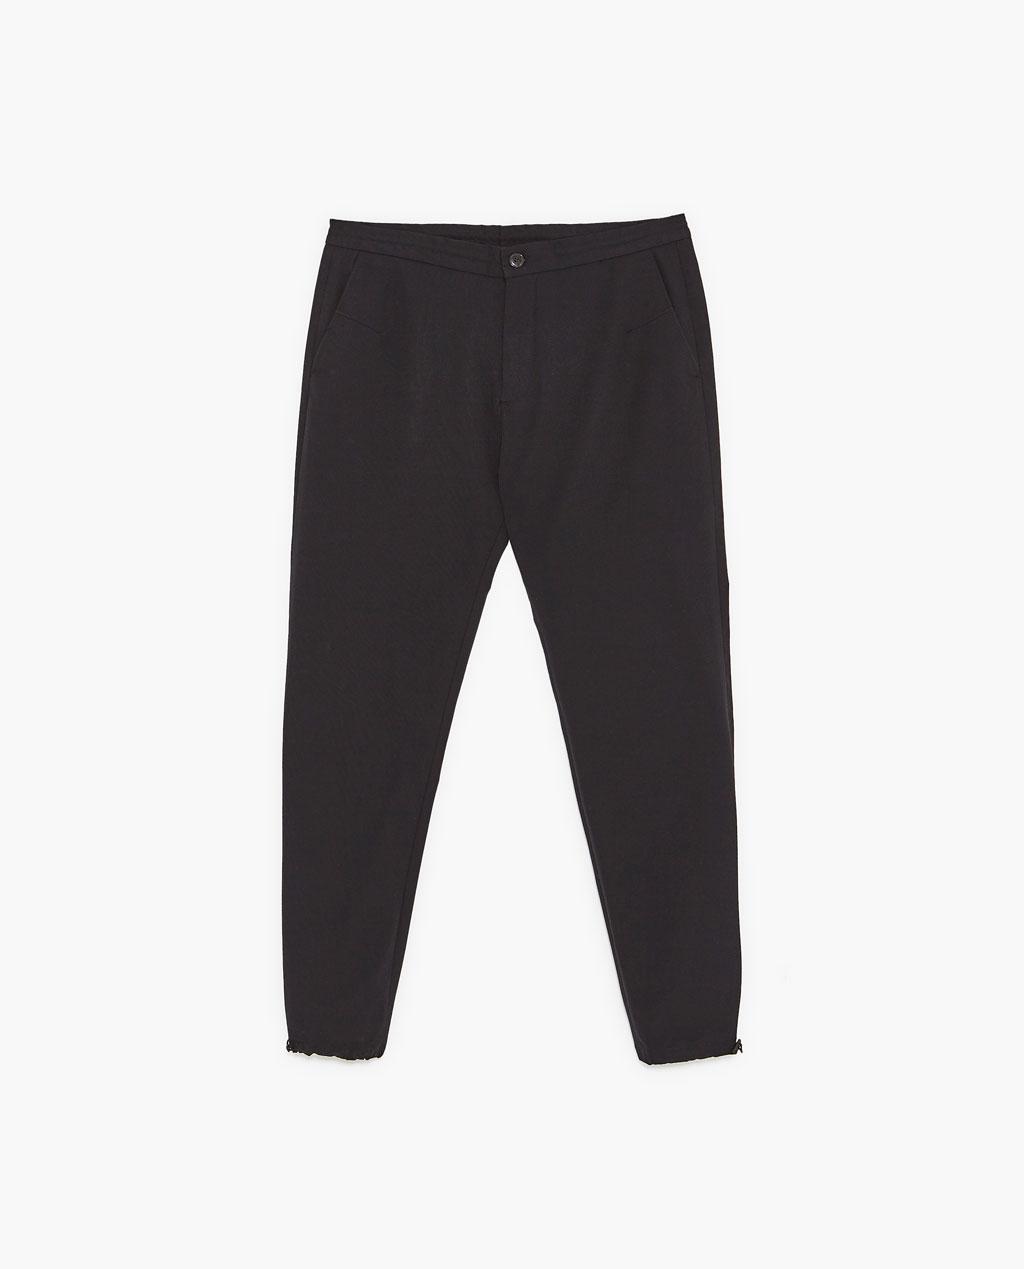 Панталон ZARA; 59.99лв